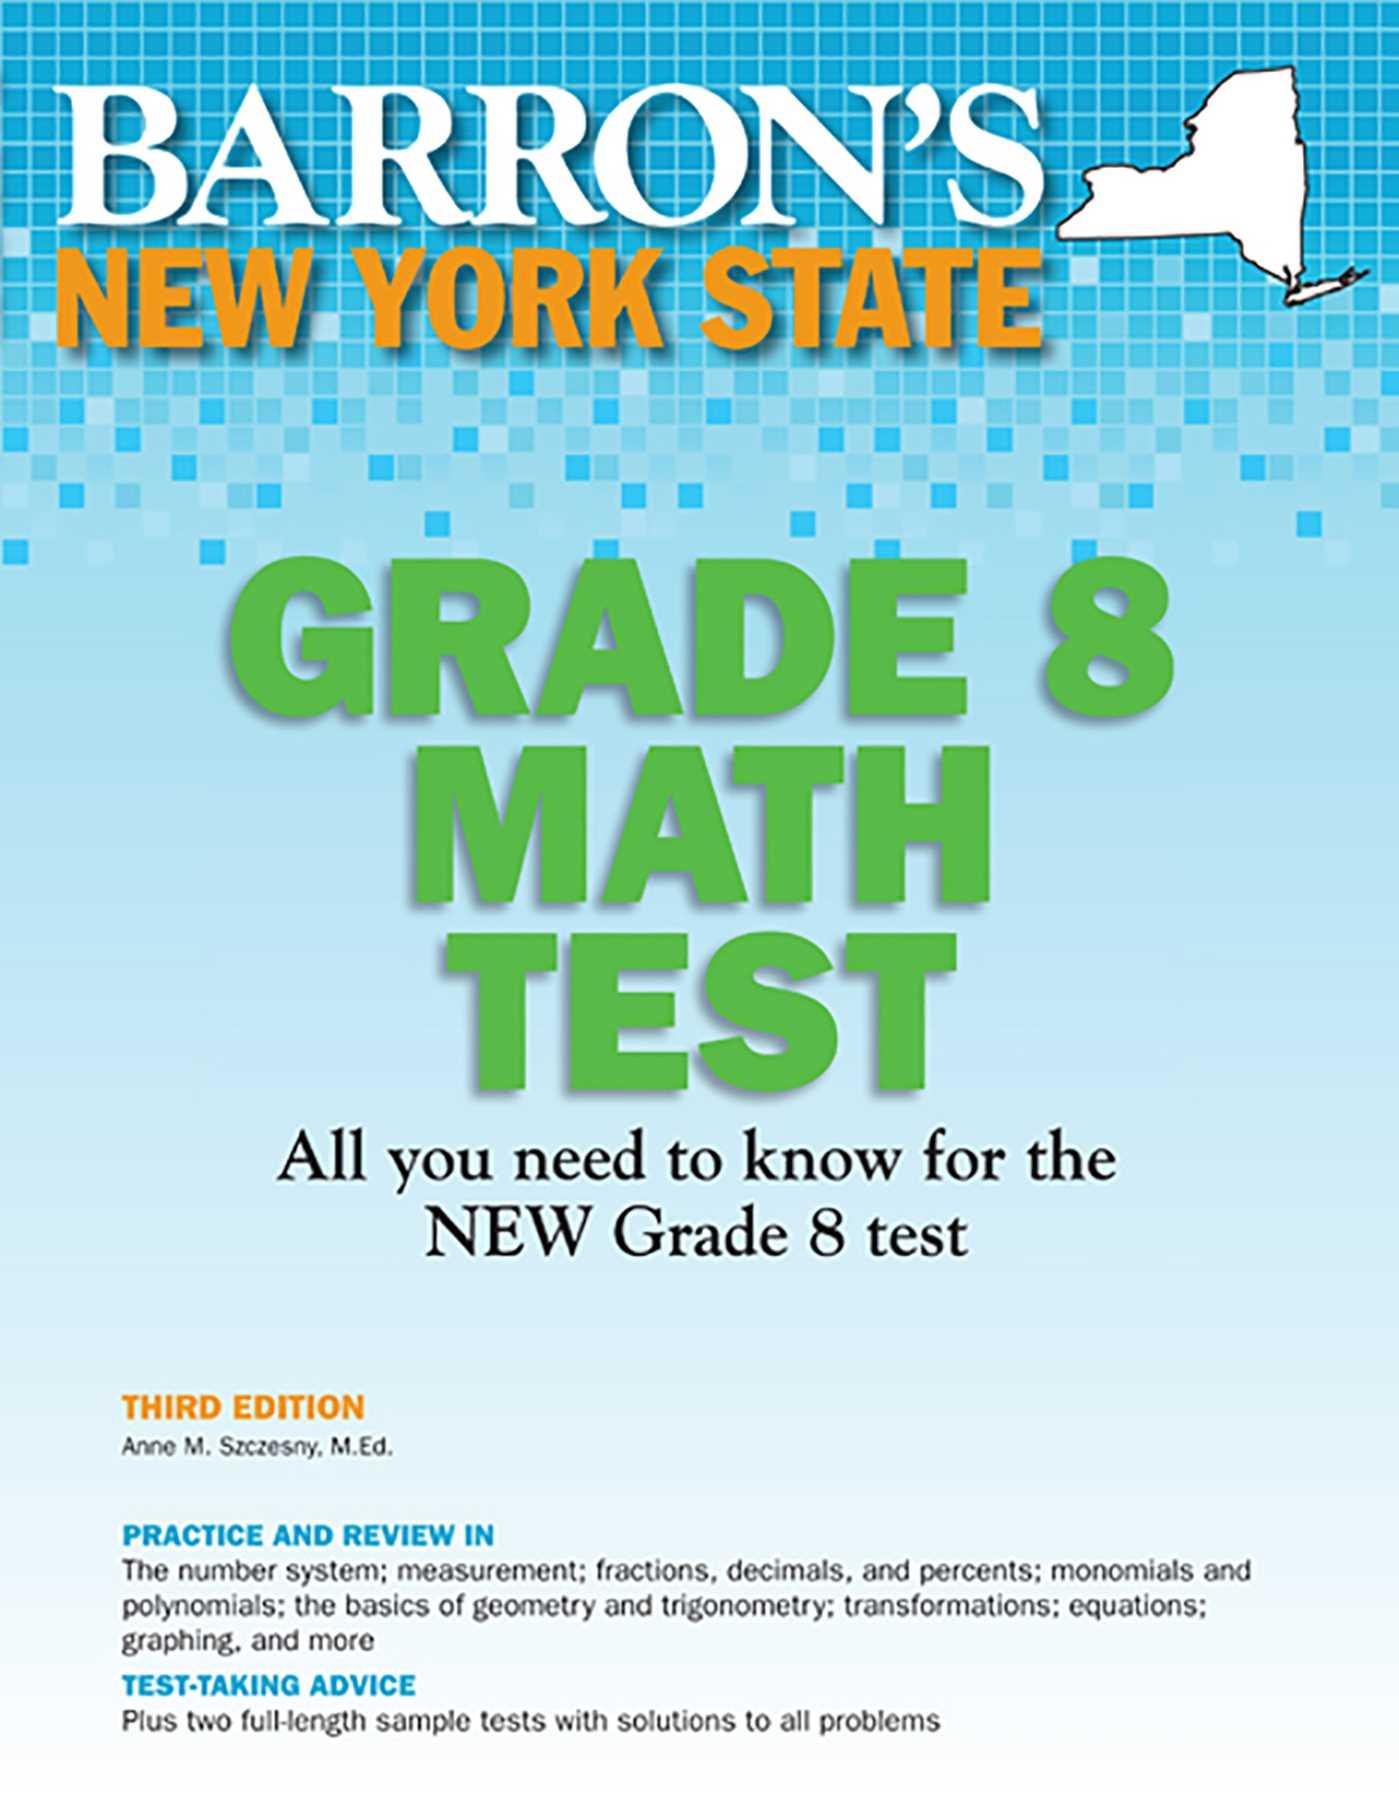 Barron's New York State Grade 8 Math Test | Book by Anne M  Szczesny